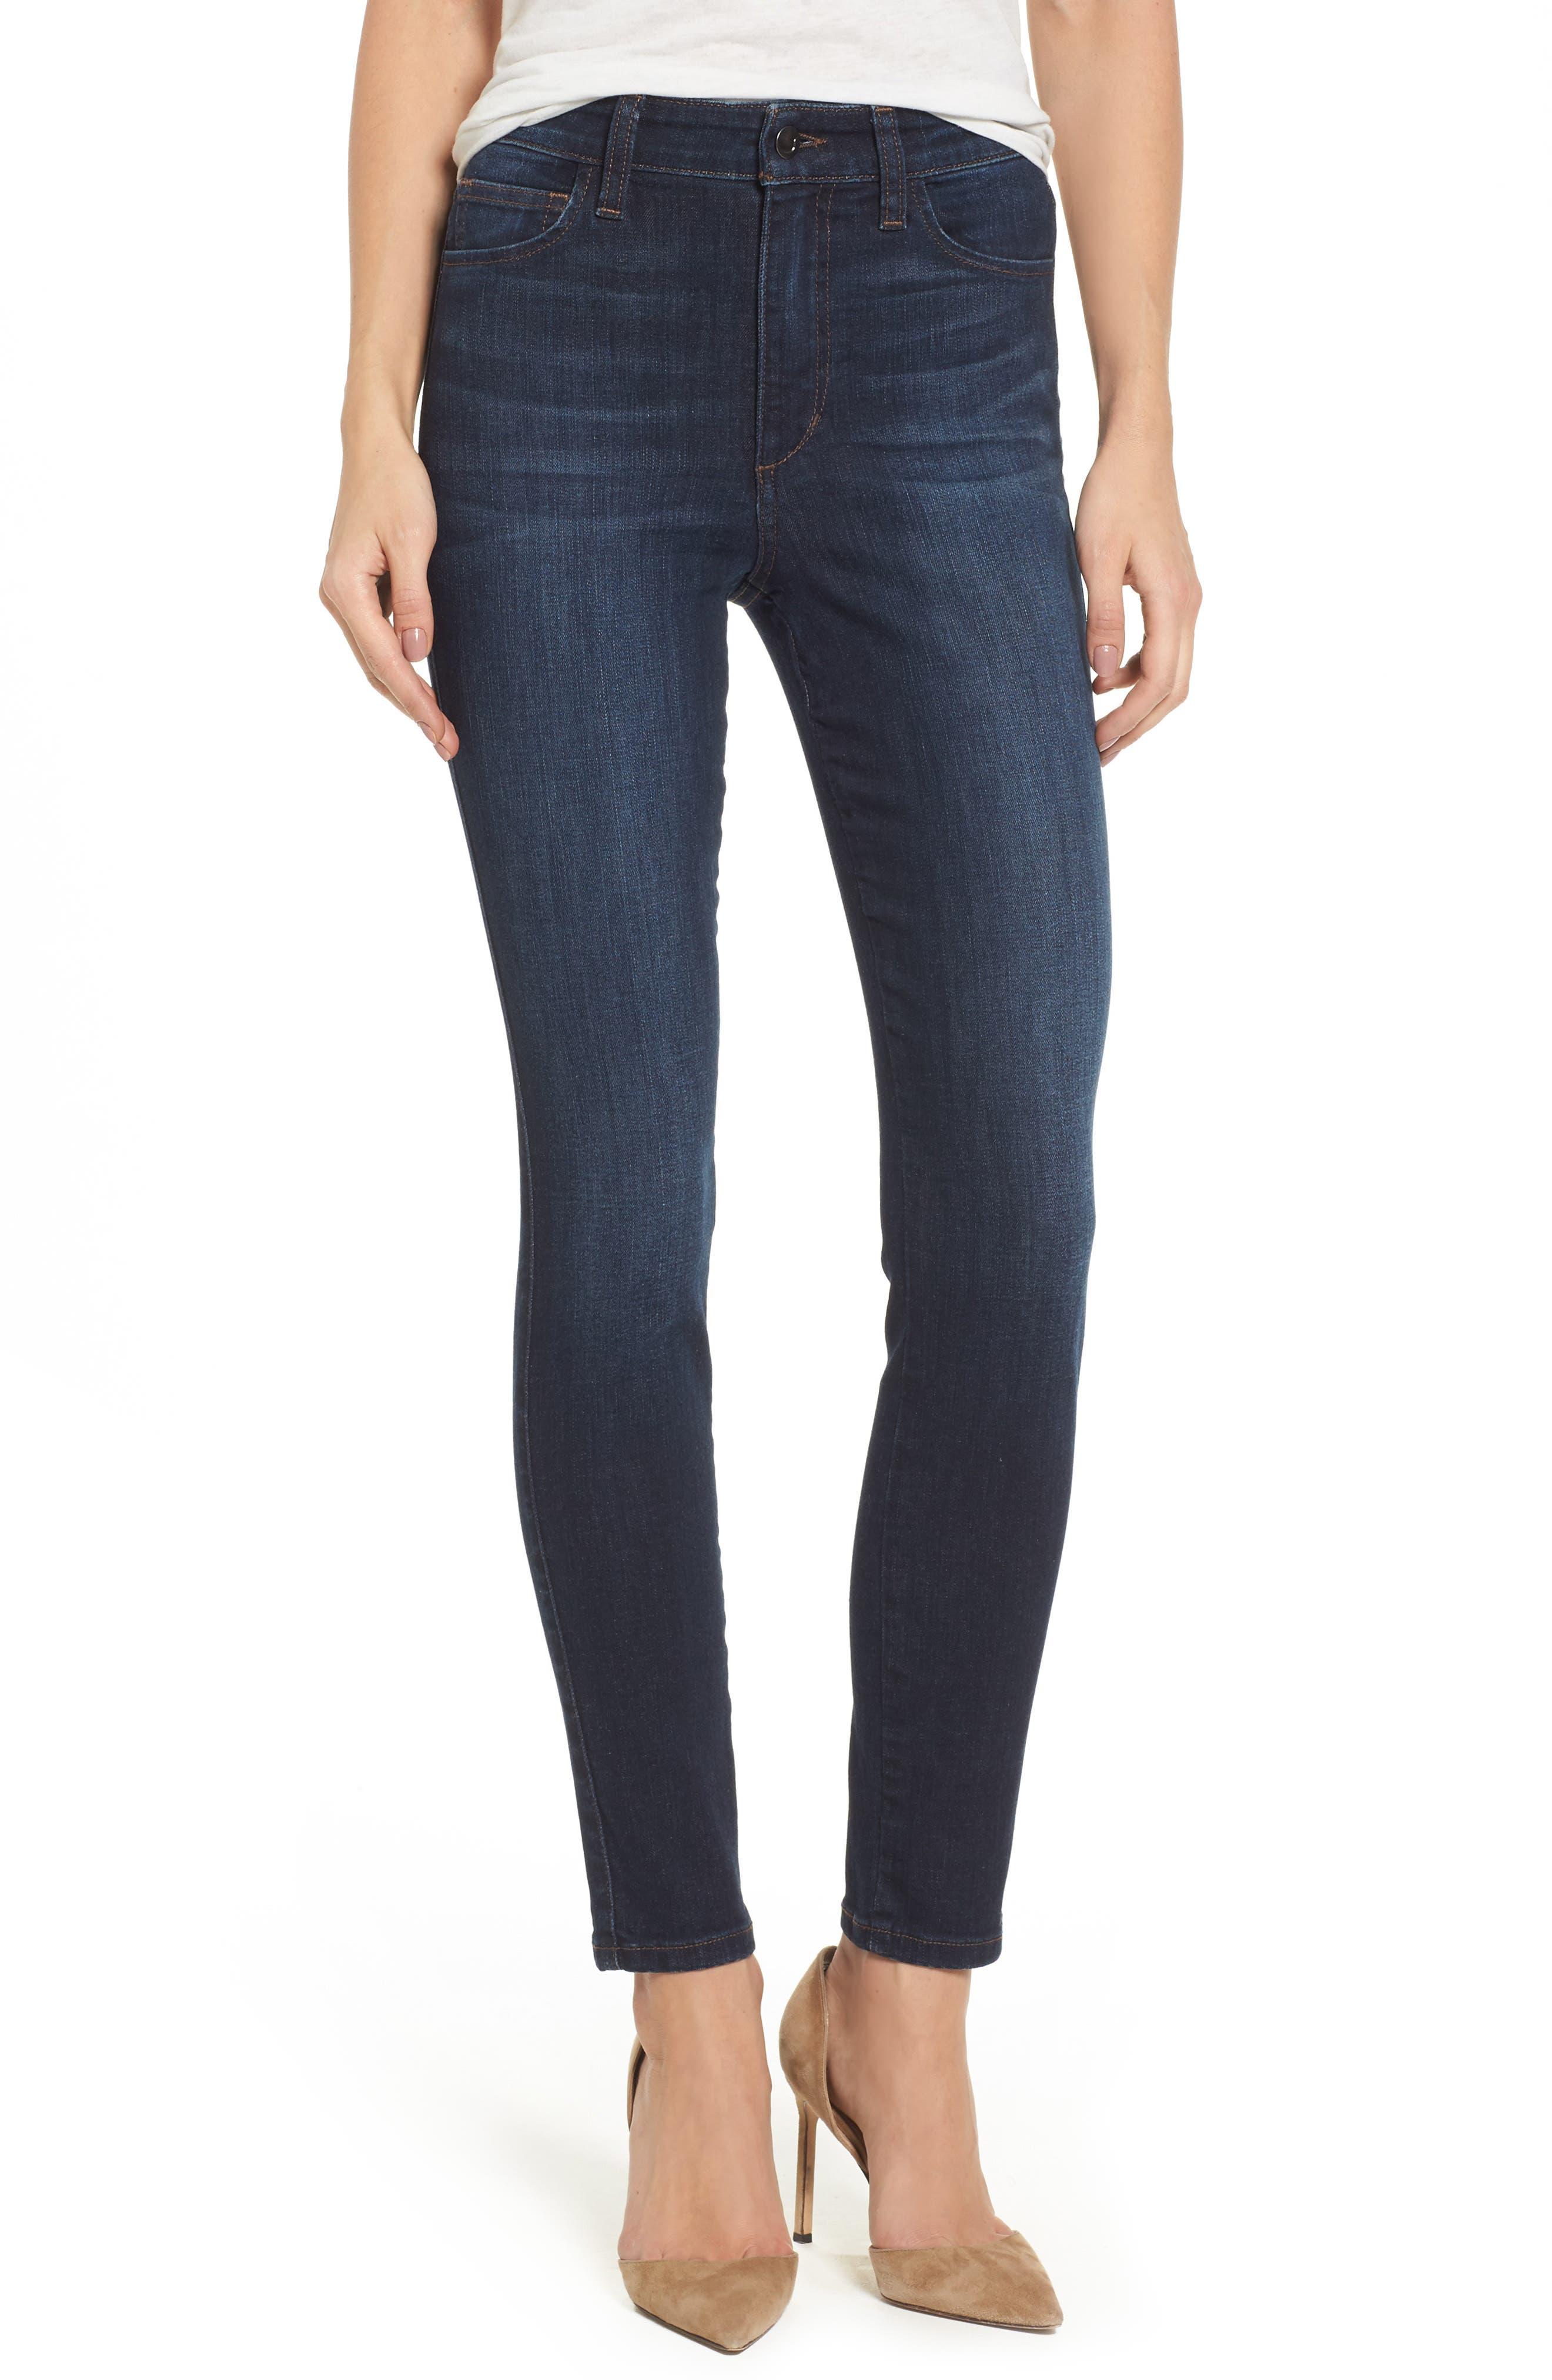 Charlie High Waist Skinny Jeans,                         Main,                         color, Narissa